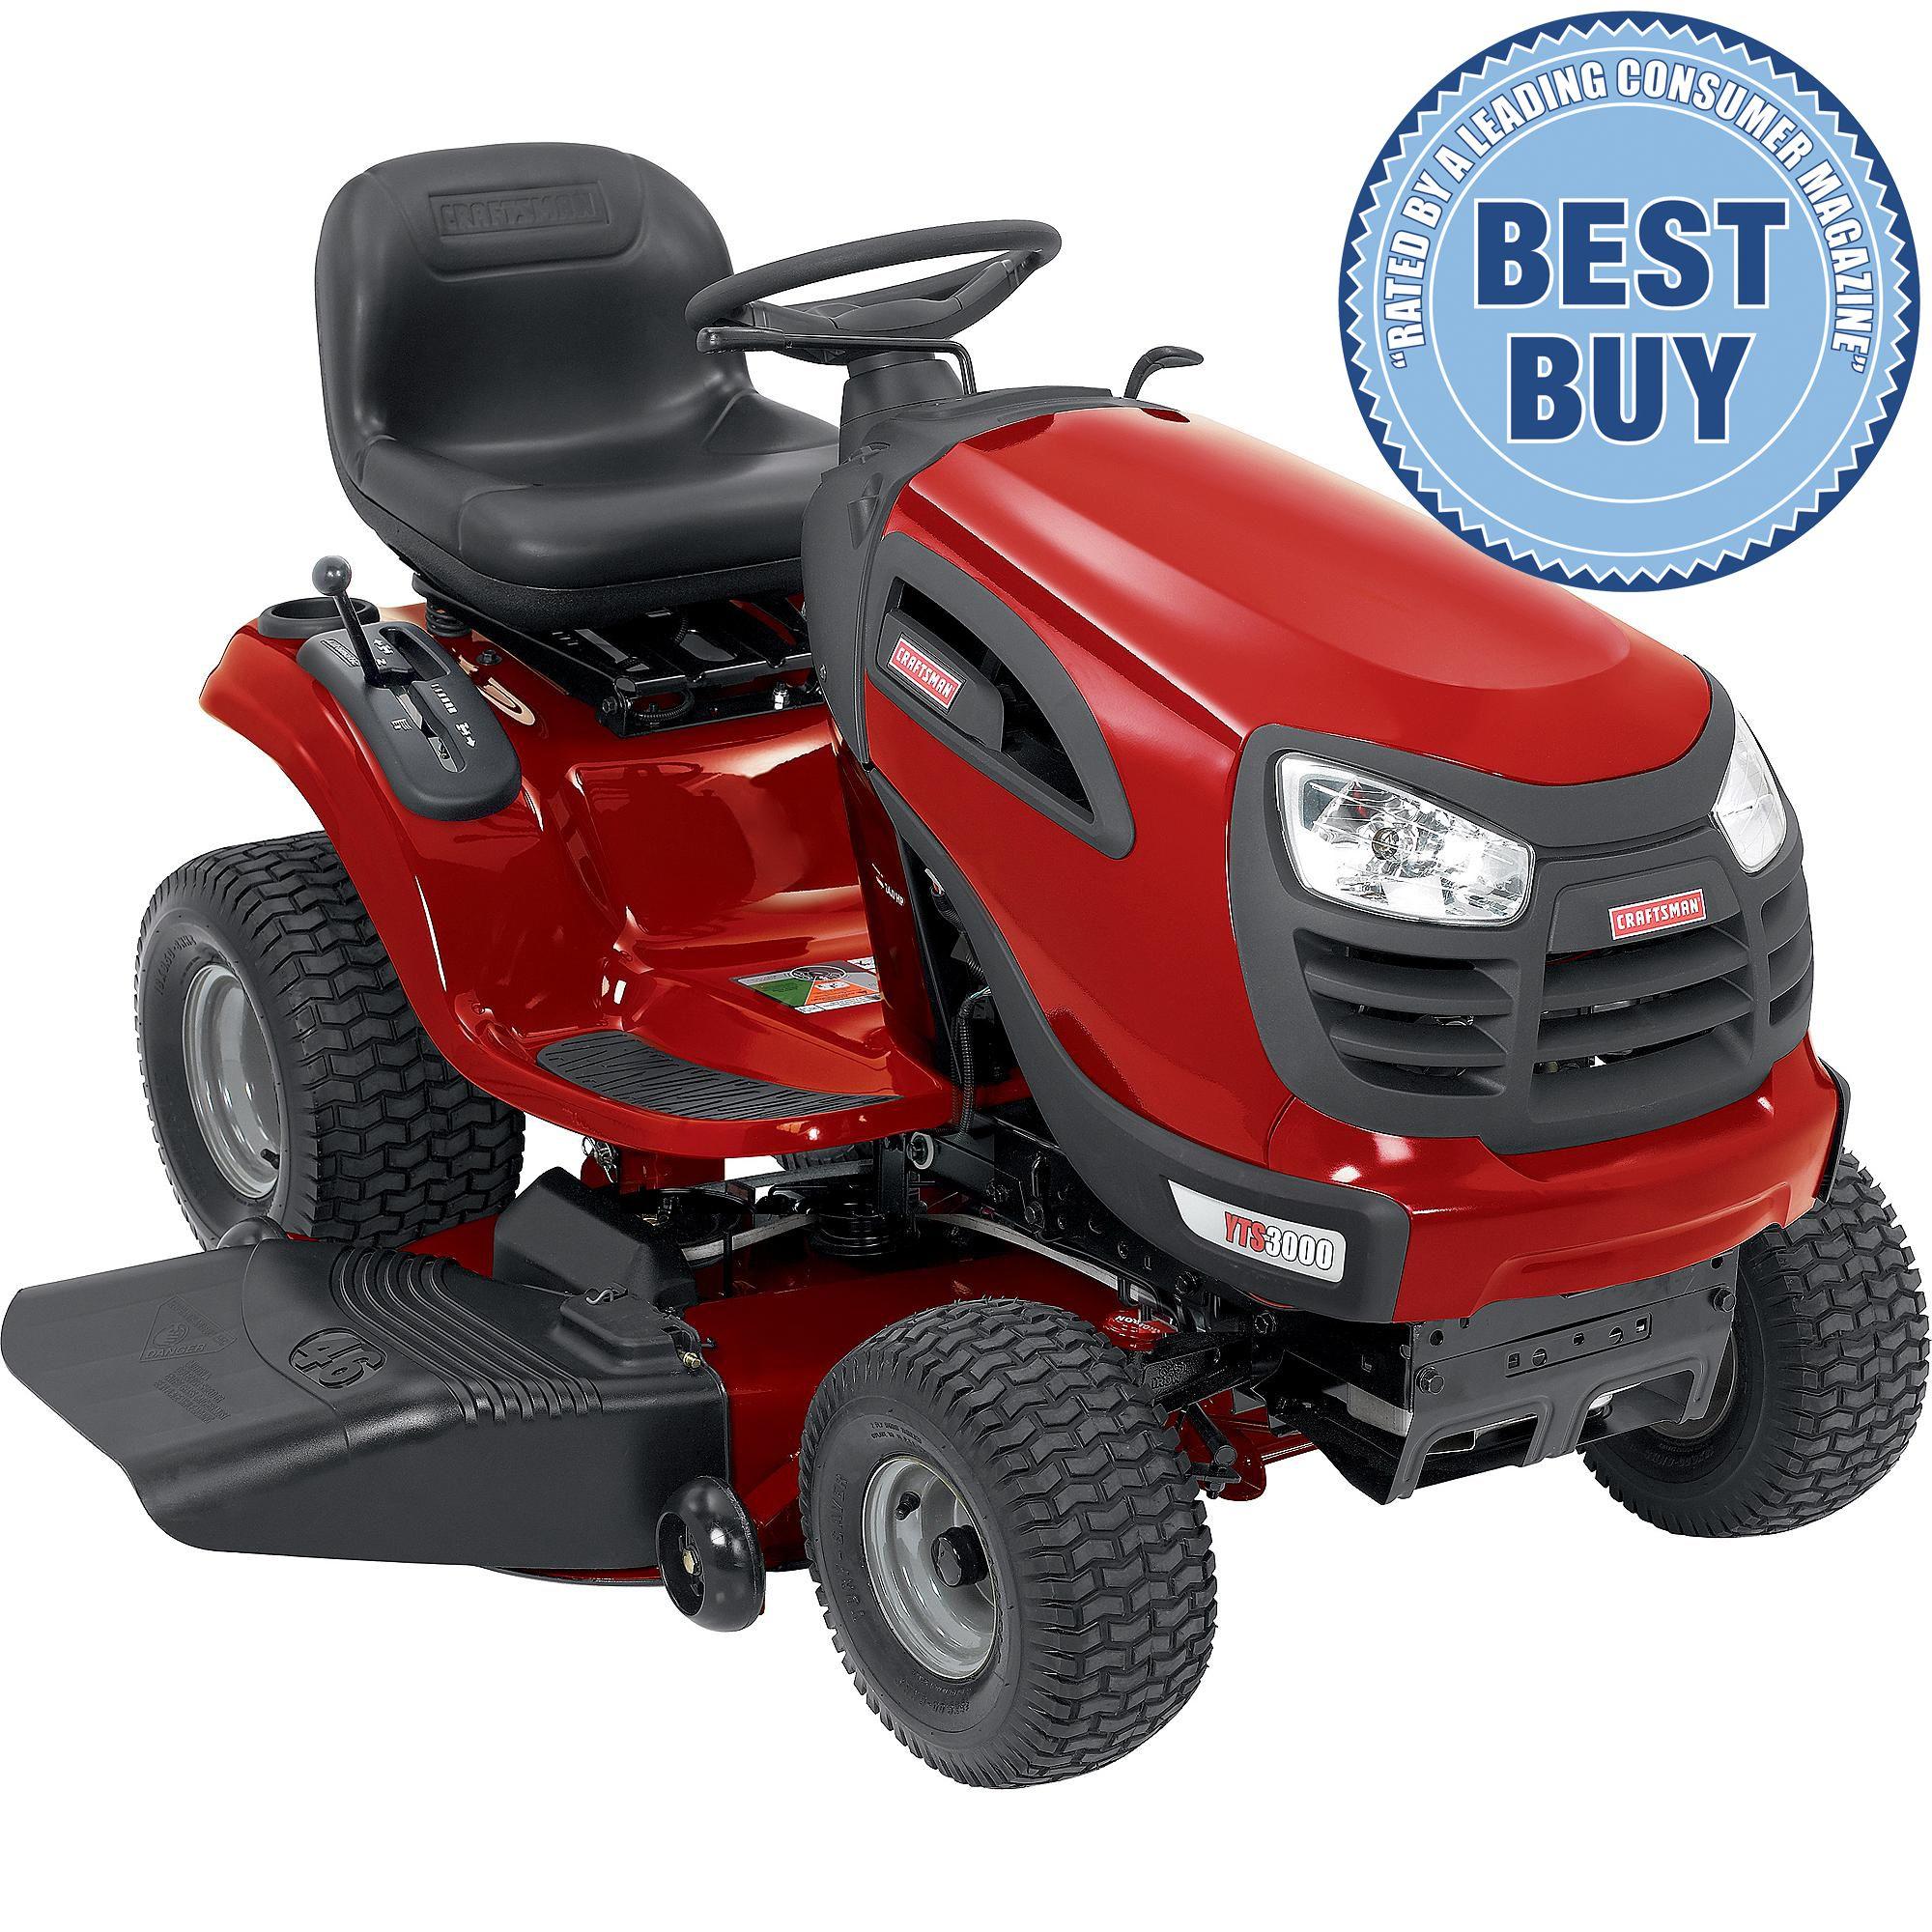 small resolution of craftsman model 917289240 lawn tractor genuine parts rh searspartsdirect com craftsman gt5000 garden tractor parts craftsman